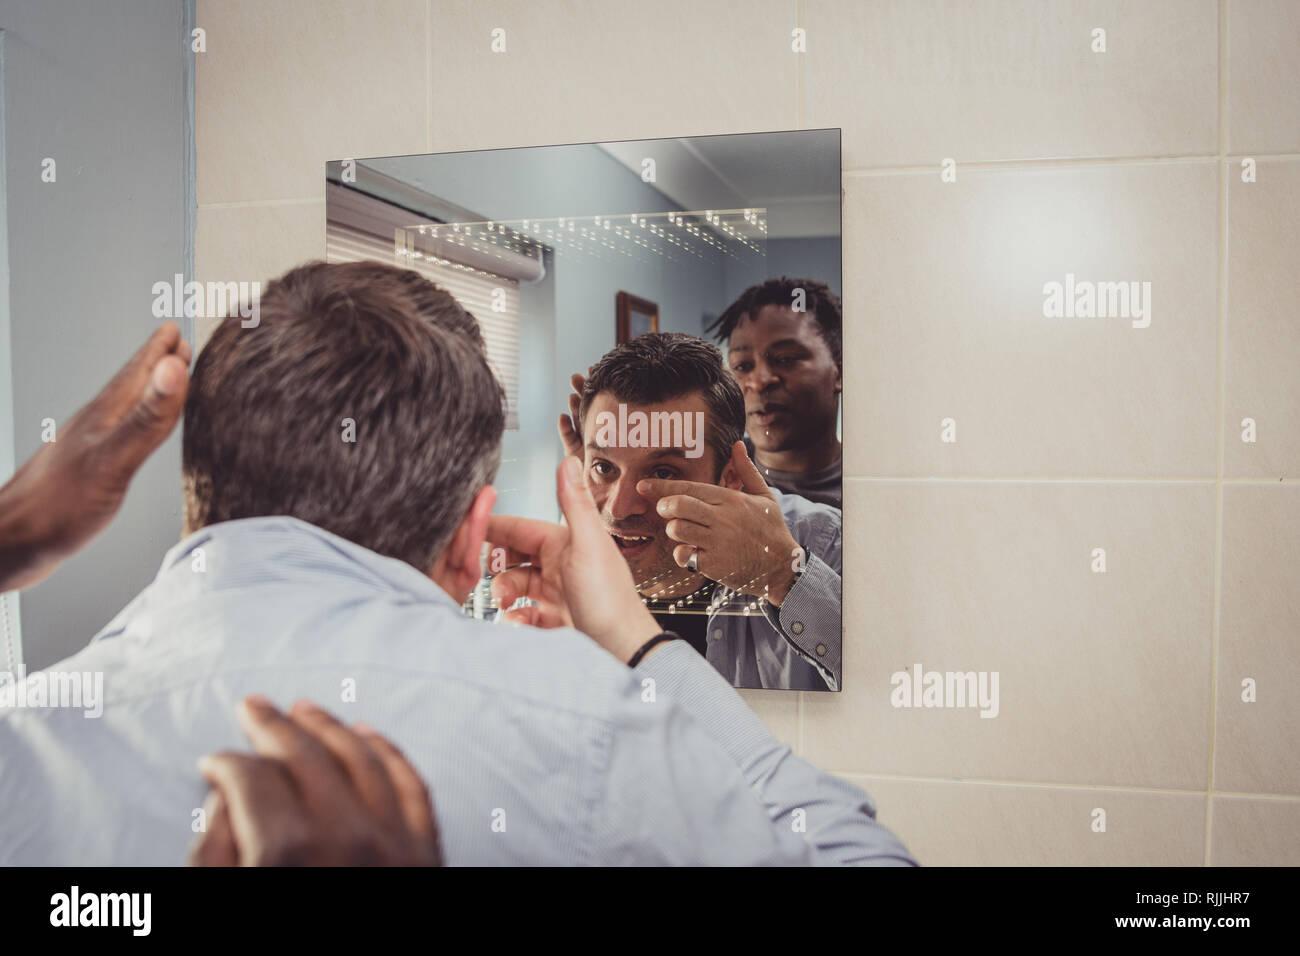 Sexe gay dans la salle de bain